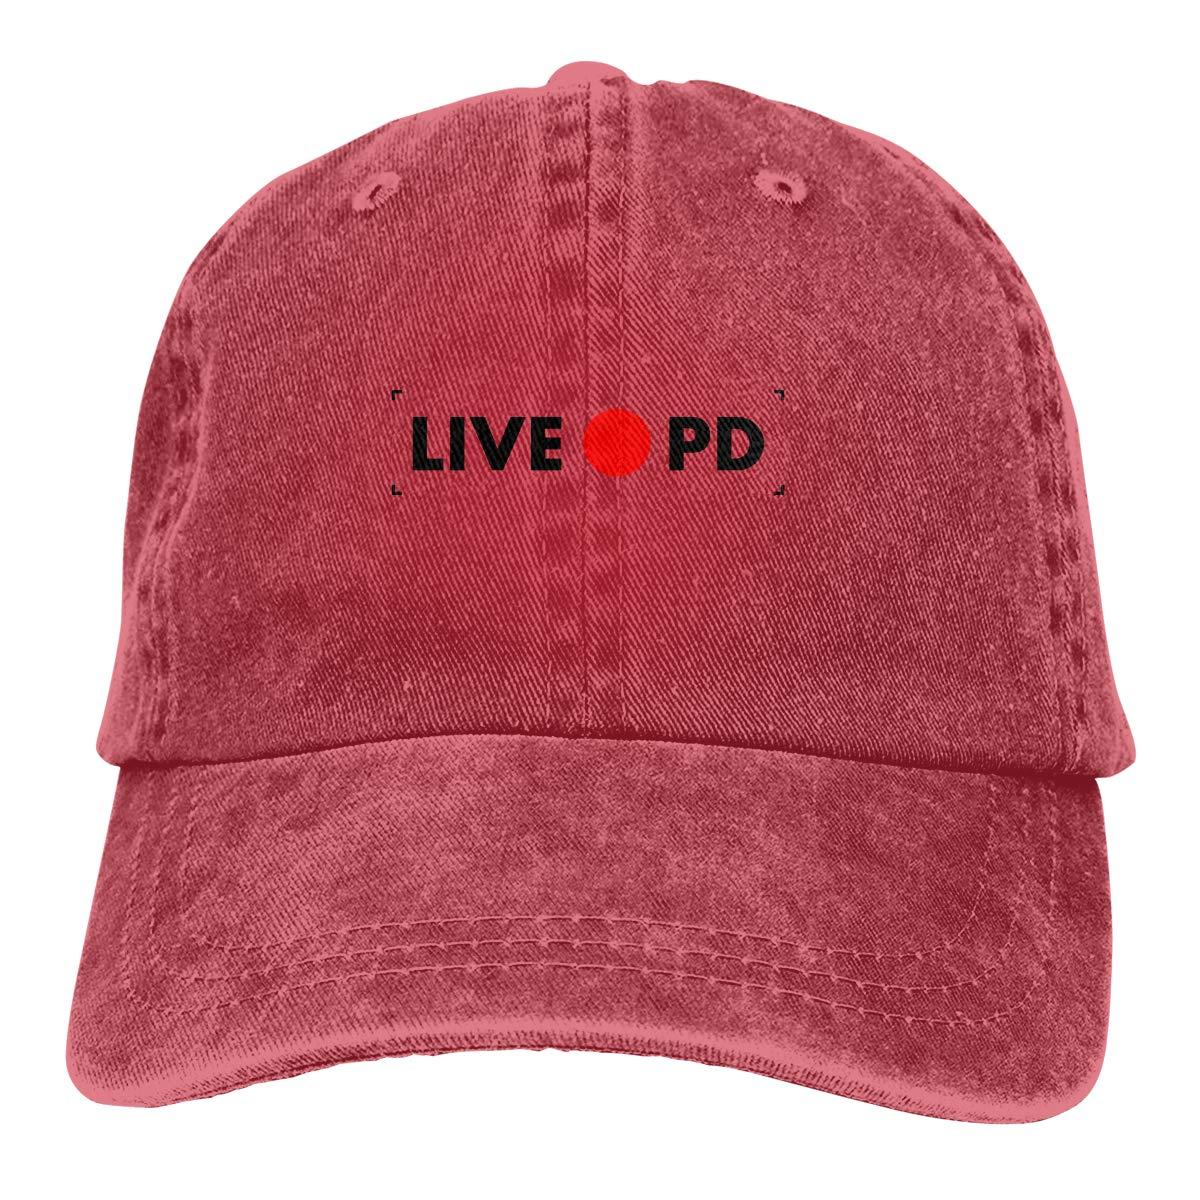 Sajfirlug Rec Live PD Fashion Adjustable Cowboy Cap Baseball Cap for Women and Men